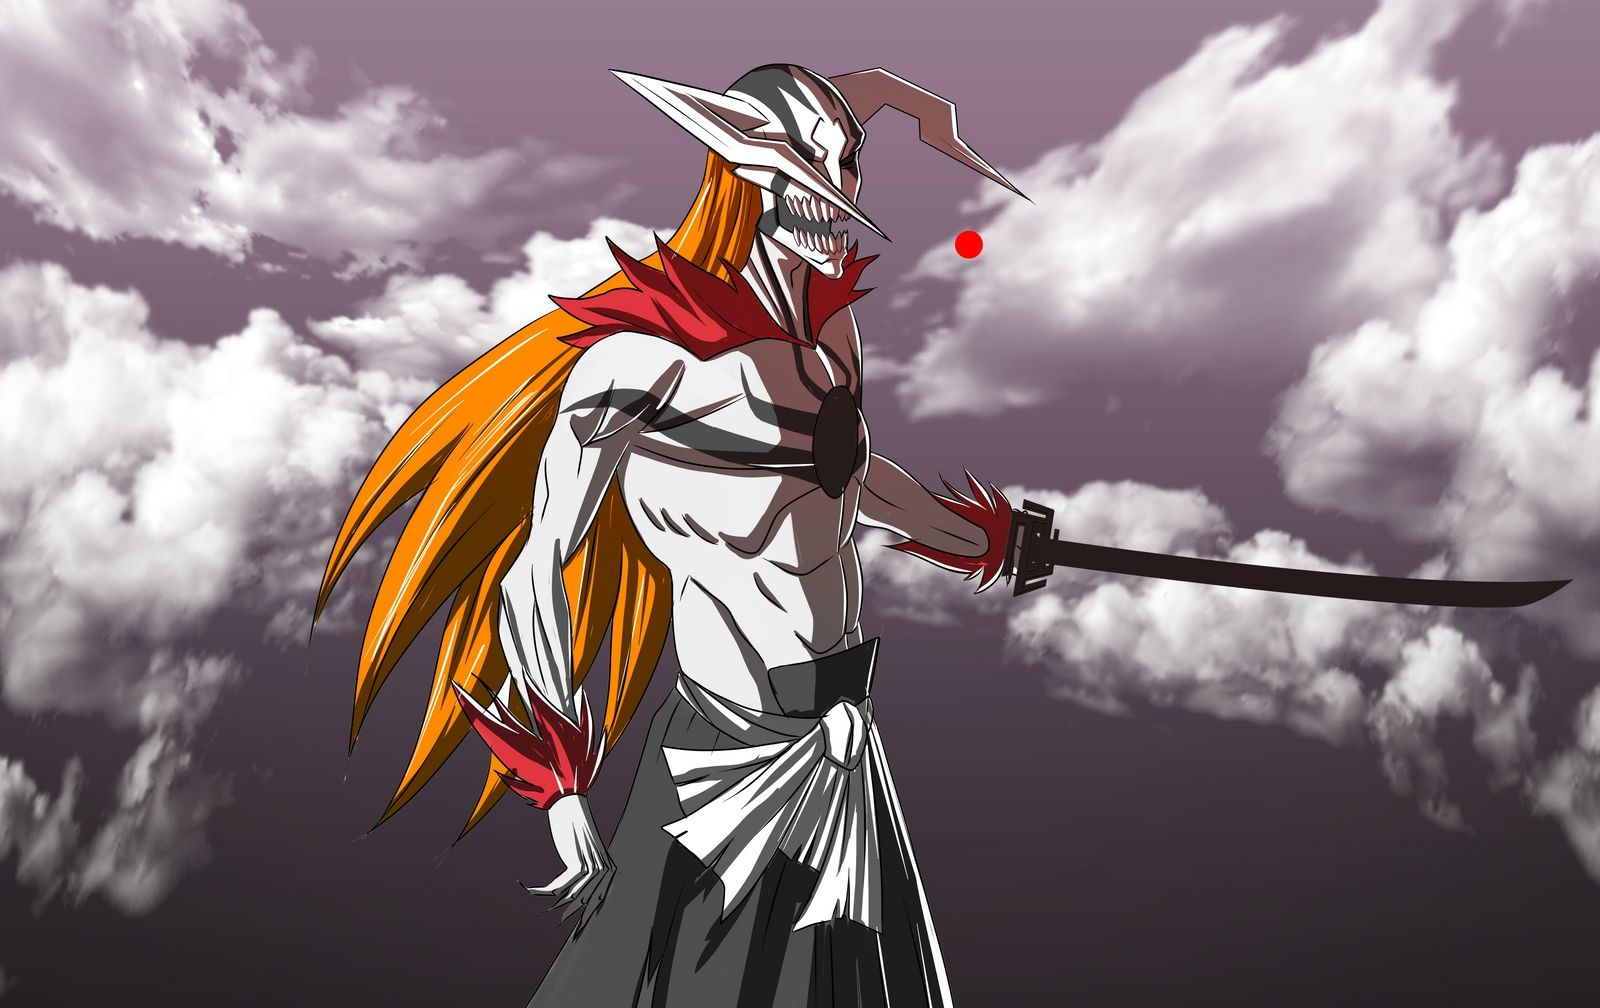 Full Hollow Form Images Manga Bleach Personagens De Anime